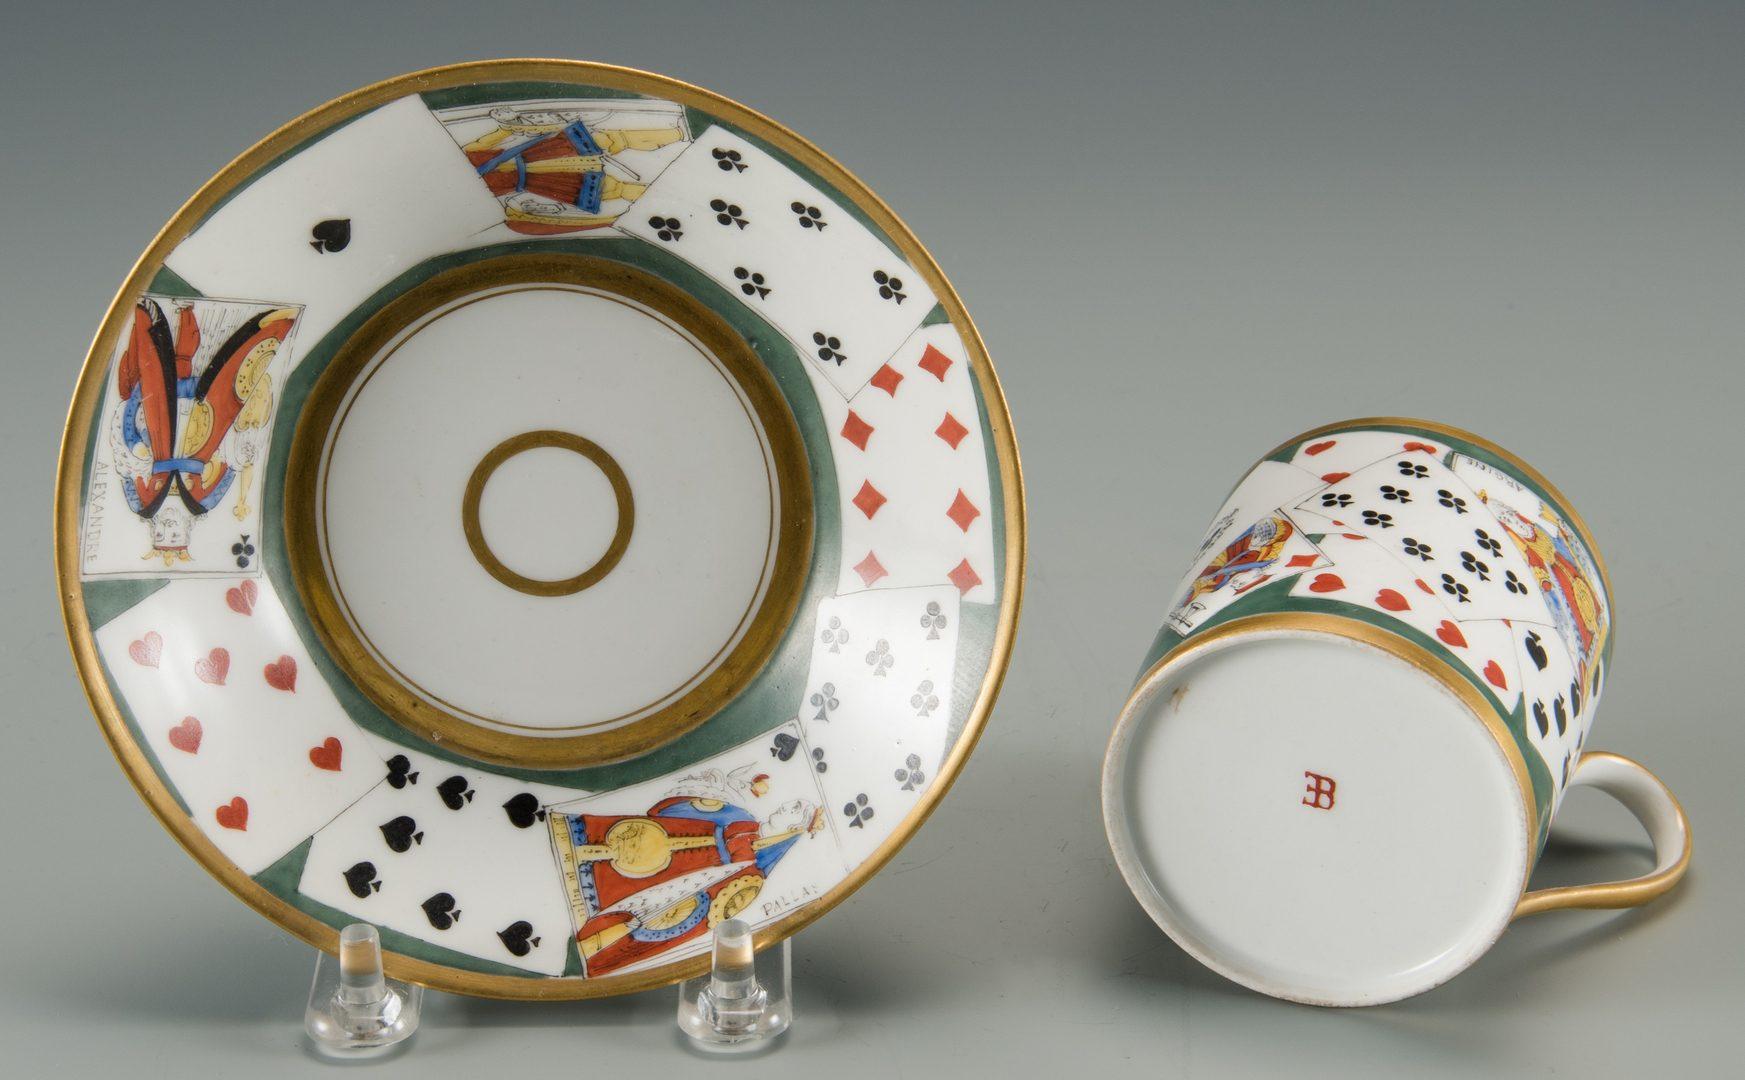 Lot 612: 4 Seasons Basket w/ Old Paris cup/saucer